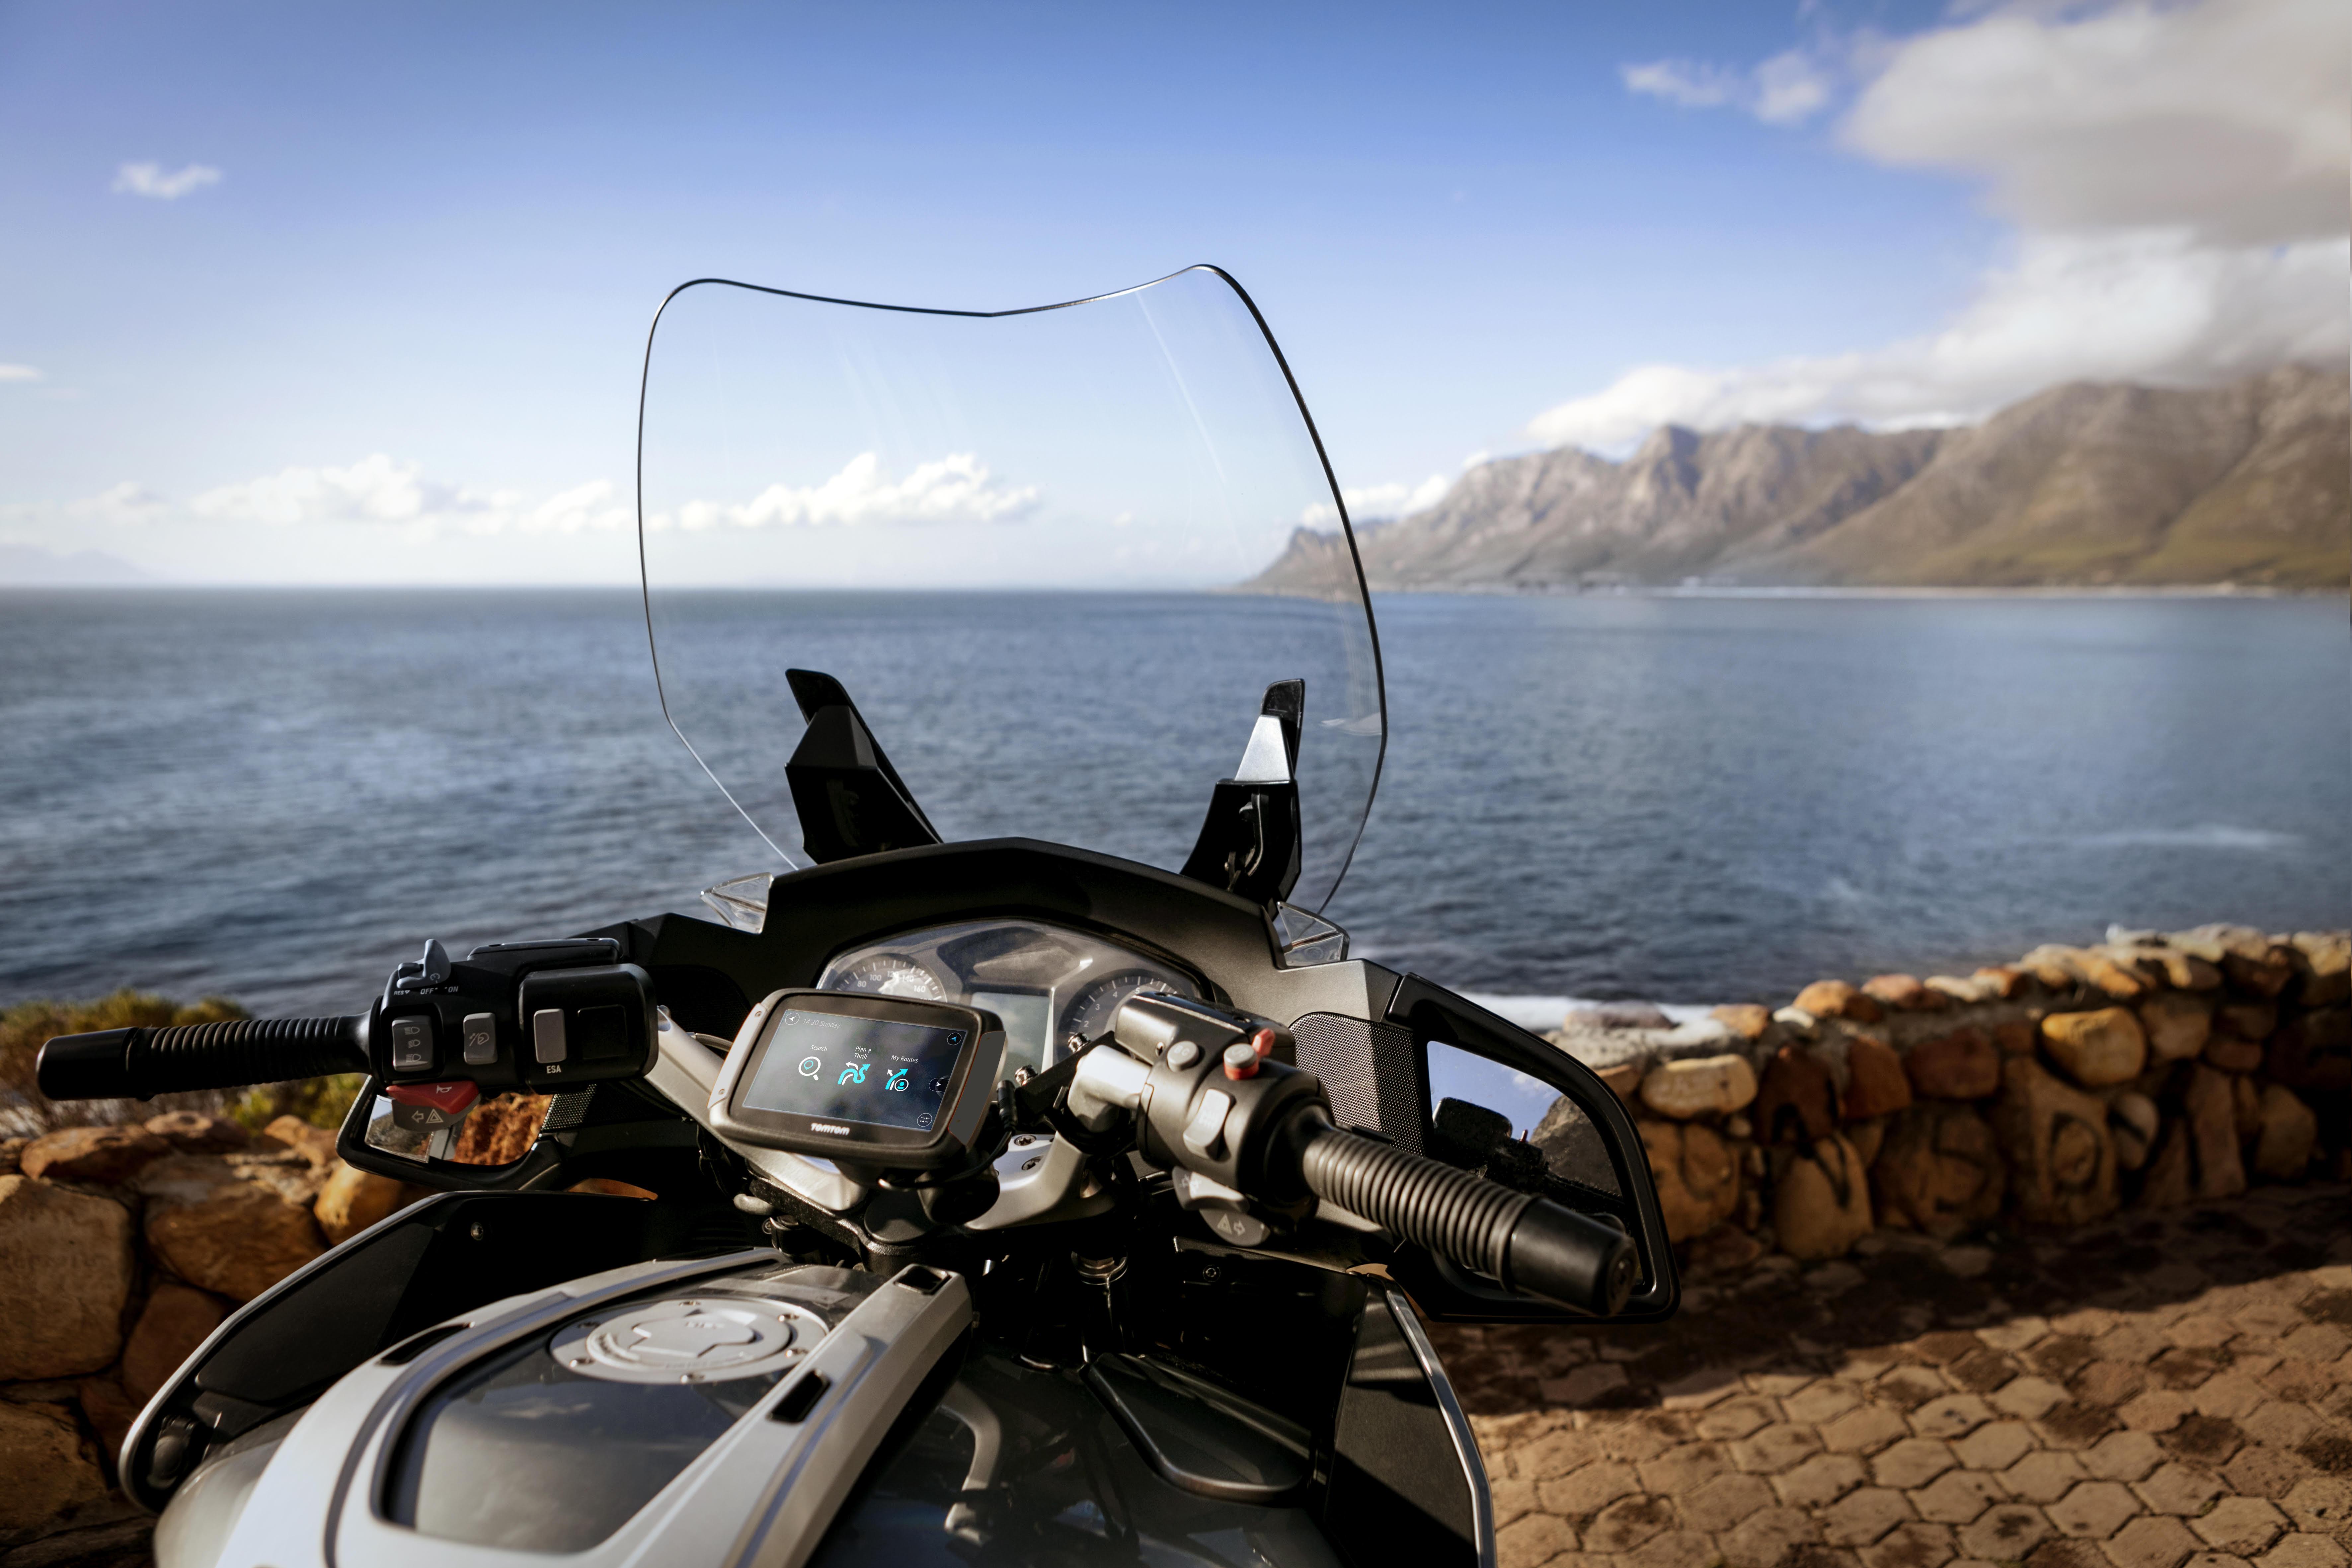 Nouvelles technologies 2019 : innovation moto